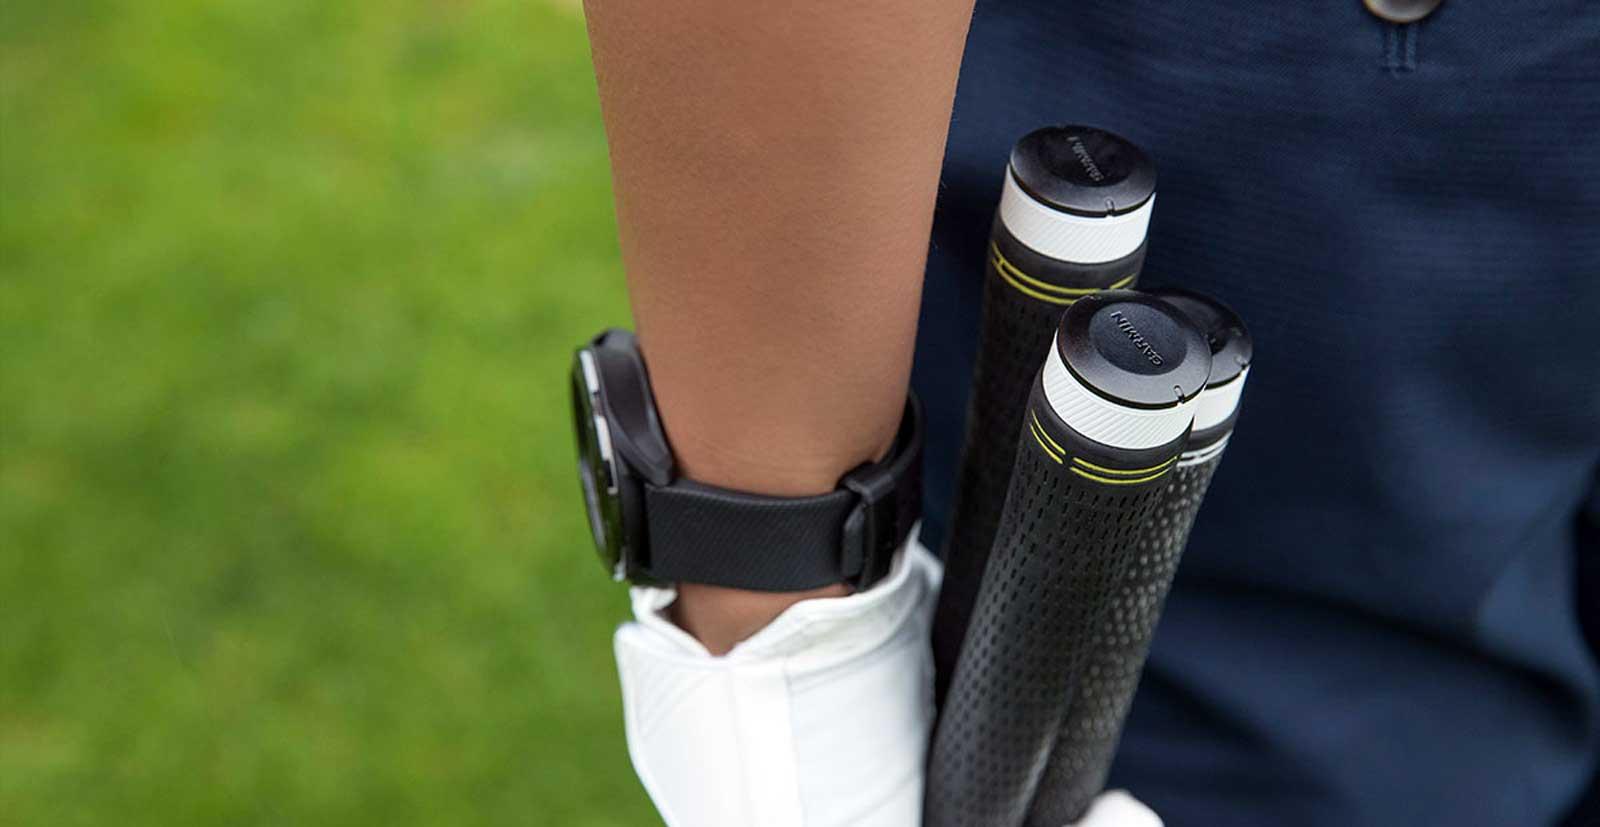 Garmin's latest golf tracker helps you choose the right club